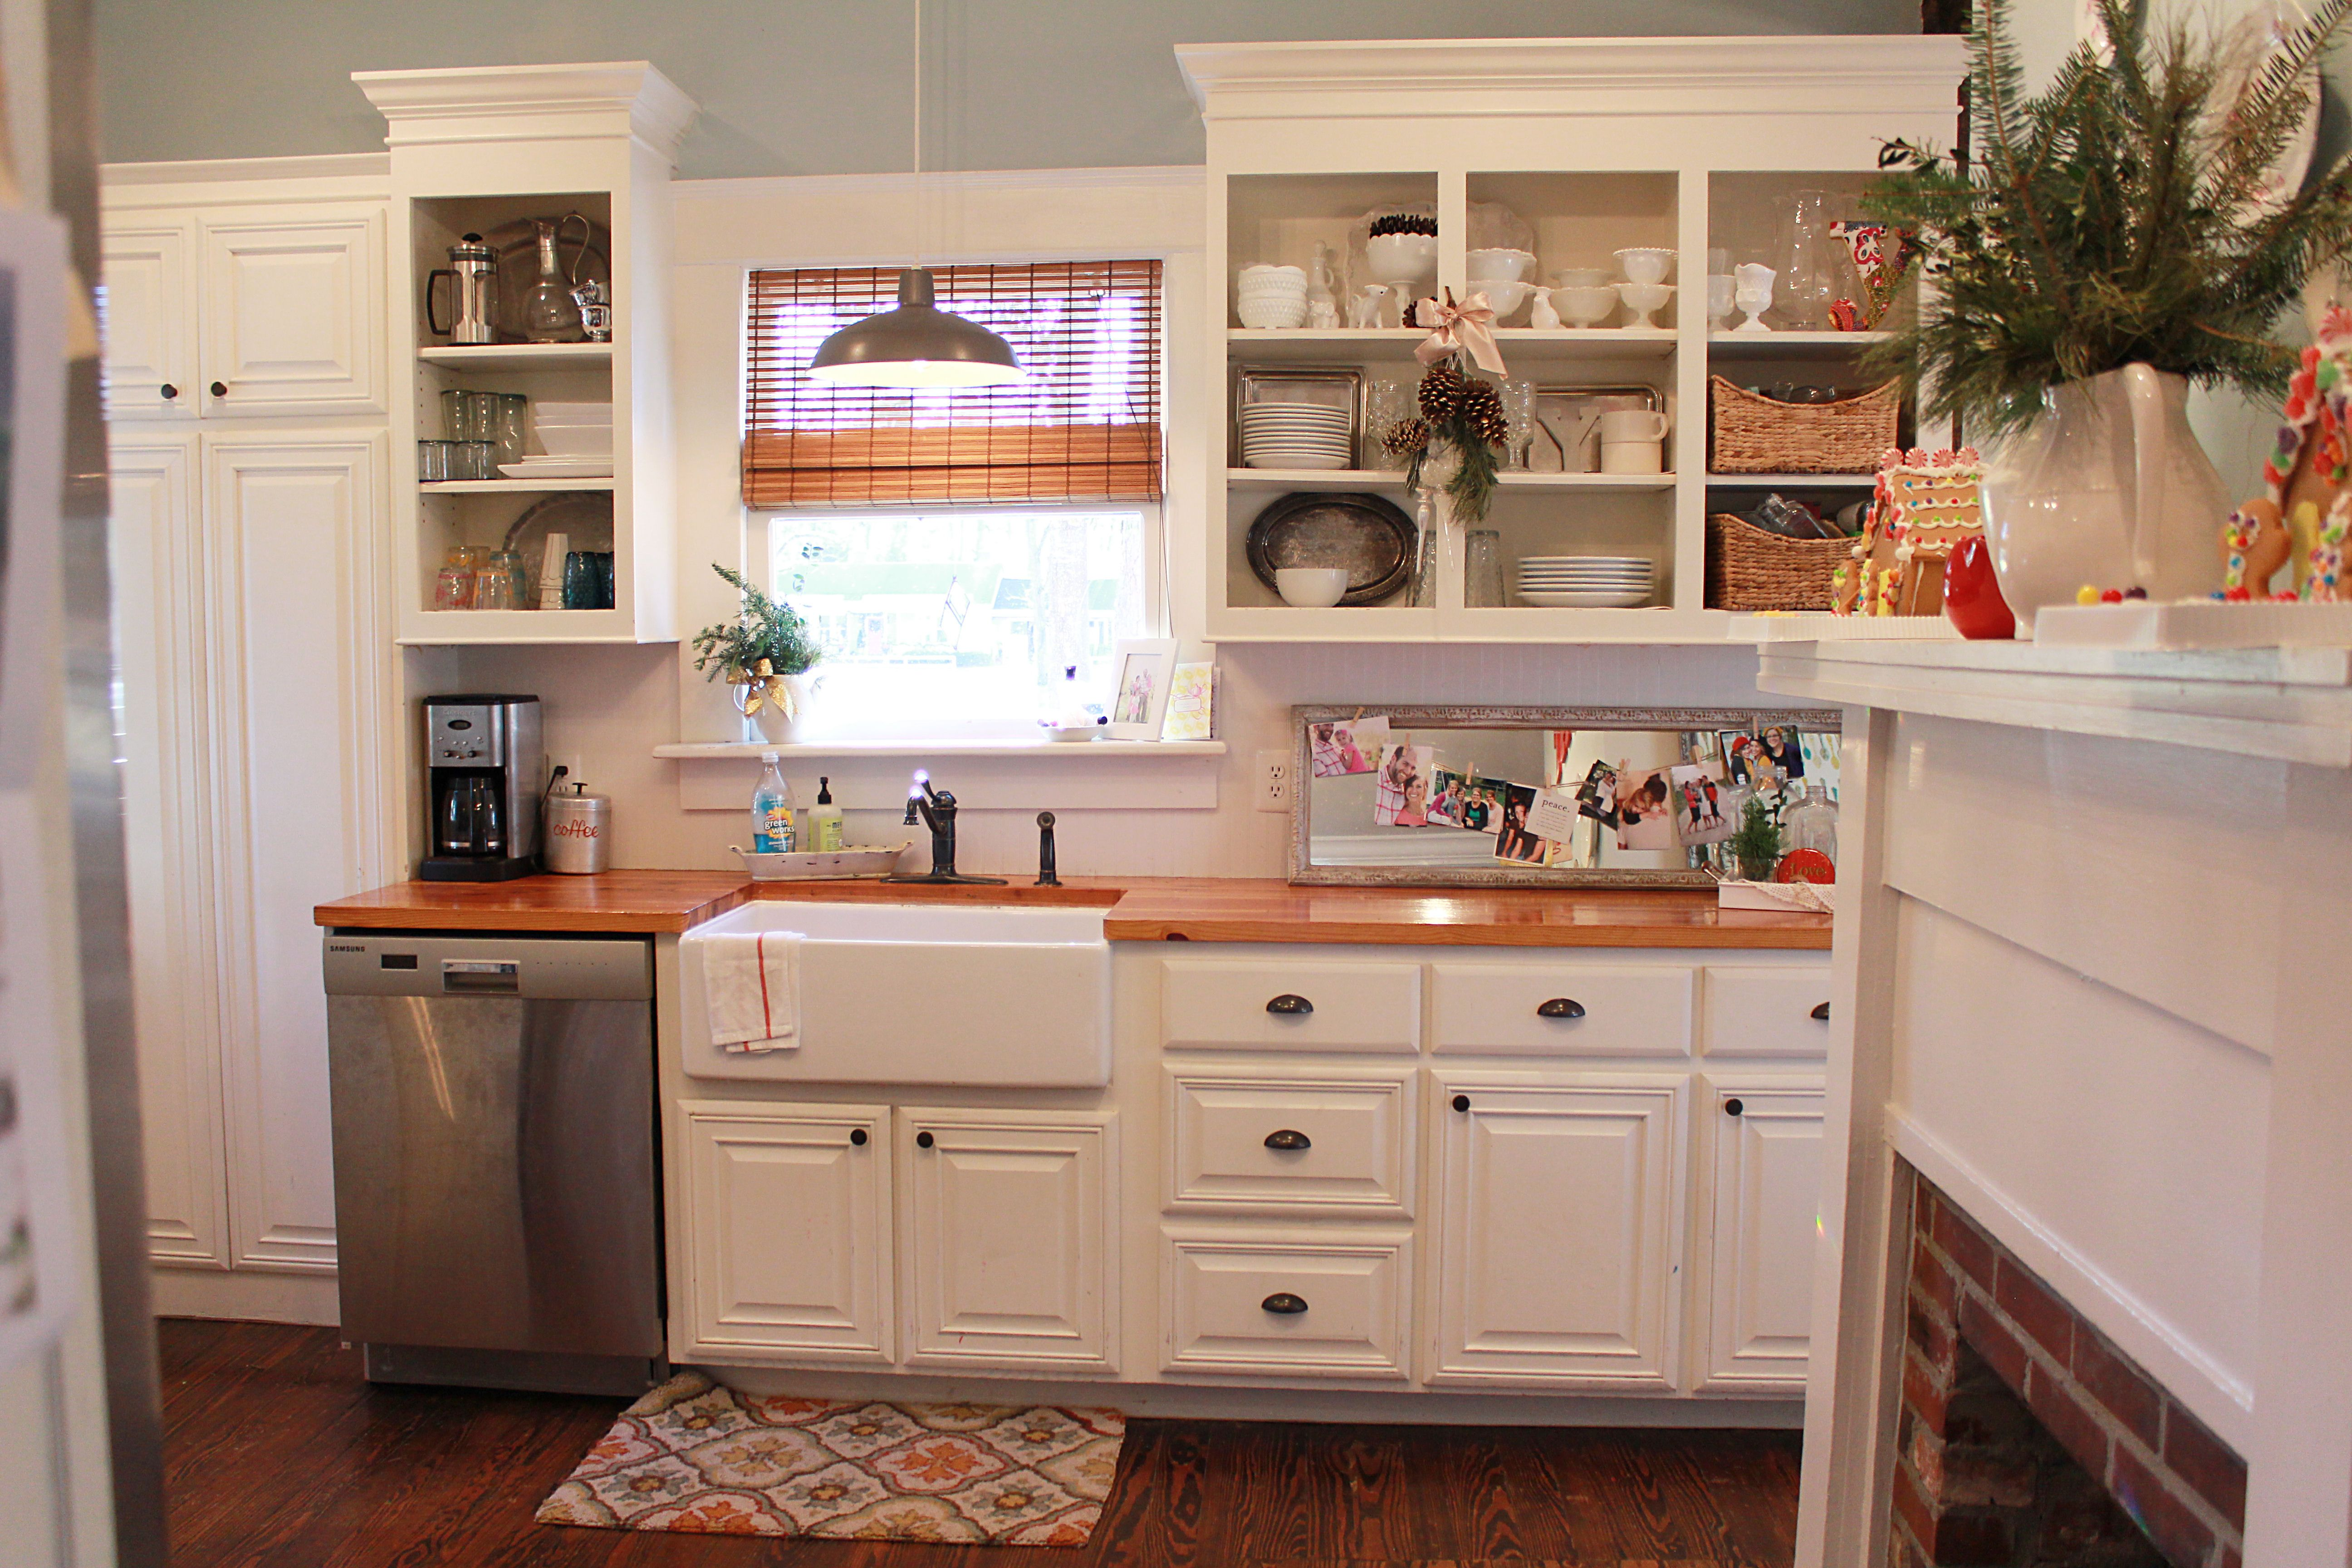 A City Cottage Christmas Tour Christmas Kitchen Decor Cozy Kitchen Kitchen Dining Room